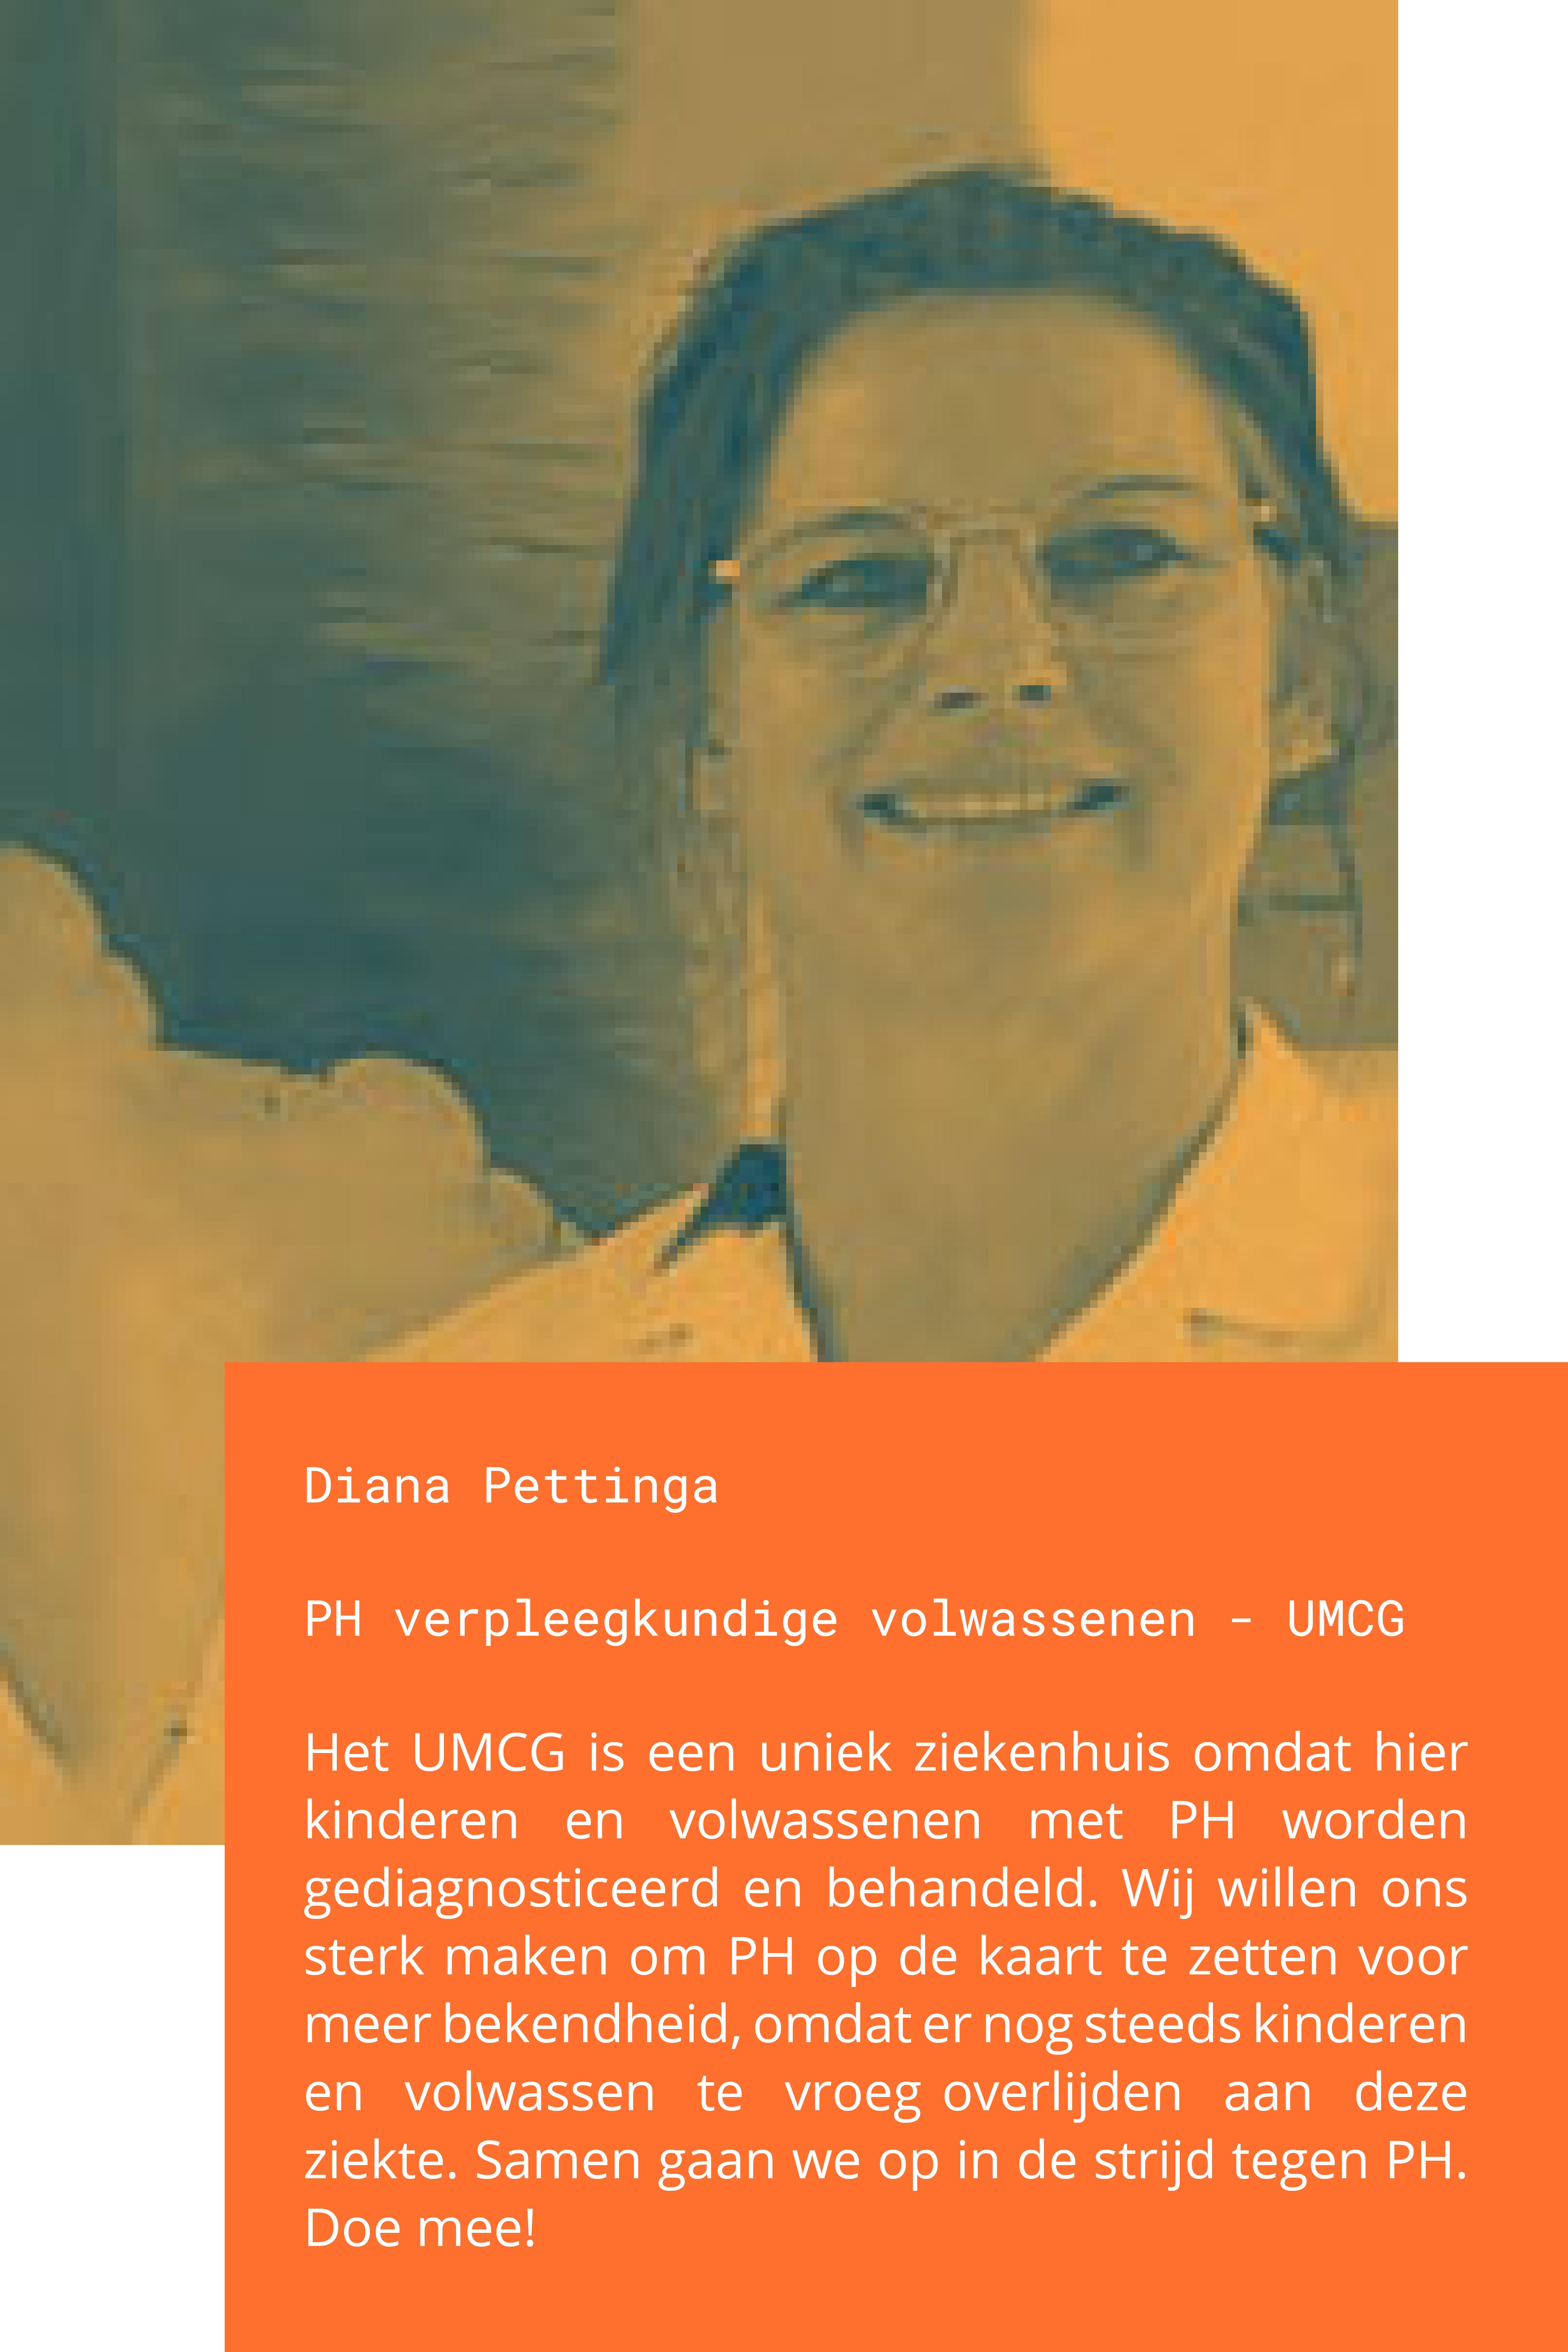 Adembenemend 2020 - Social - Diana Pettinga (1)